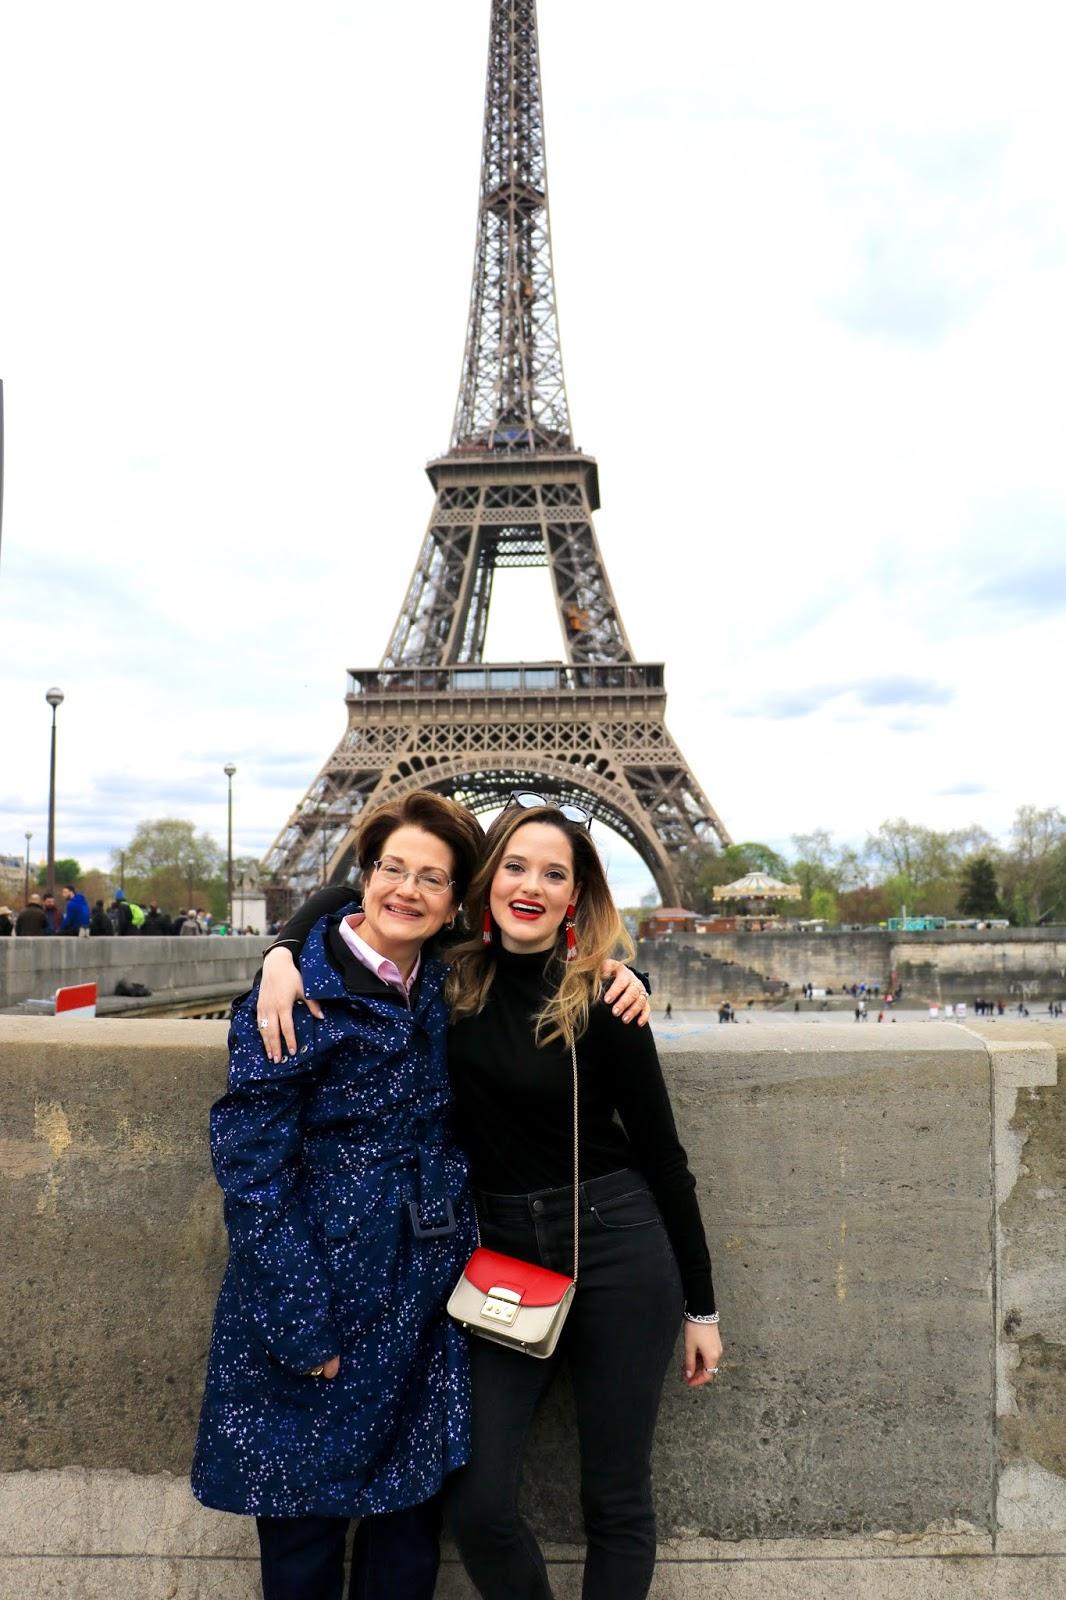 Paris Eiffel Tower photo shoot locations